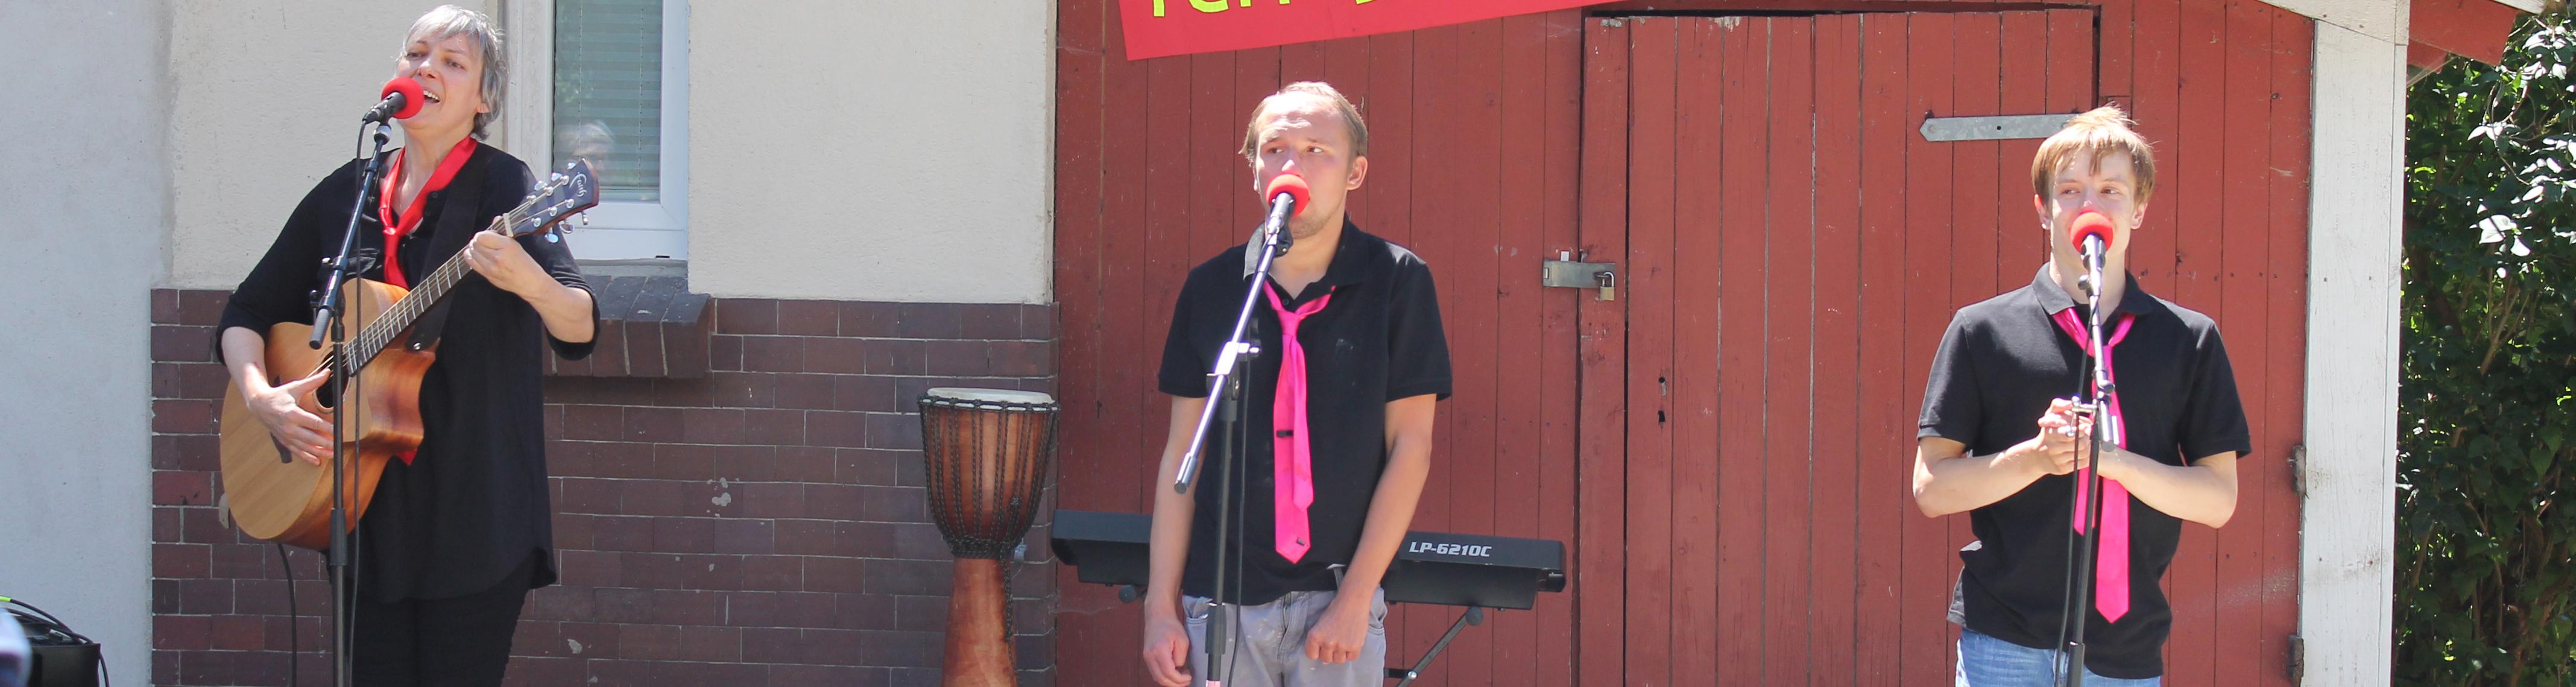 Song-Werkstatt AWG Reitbrook